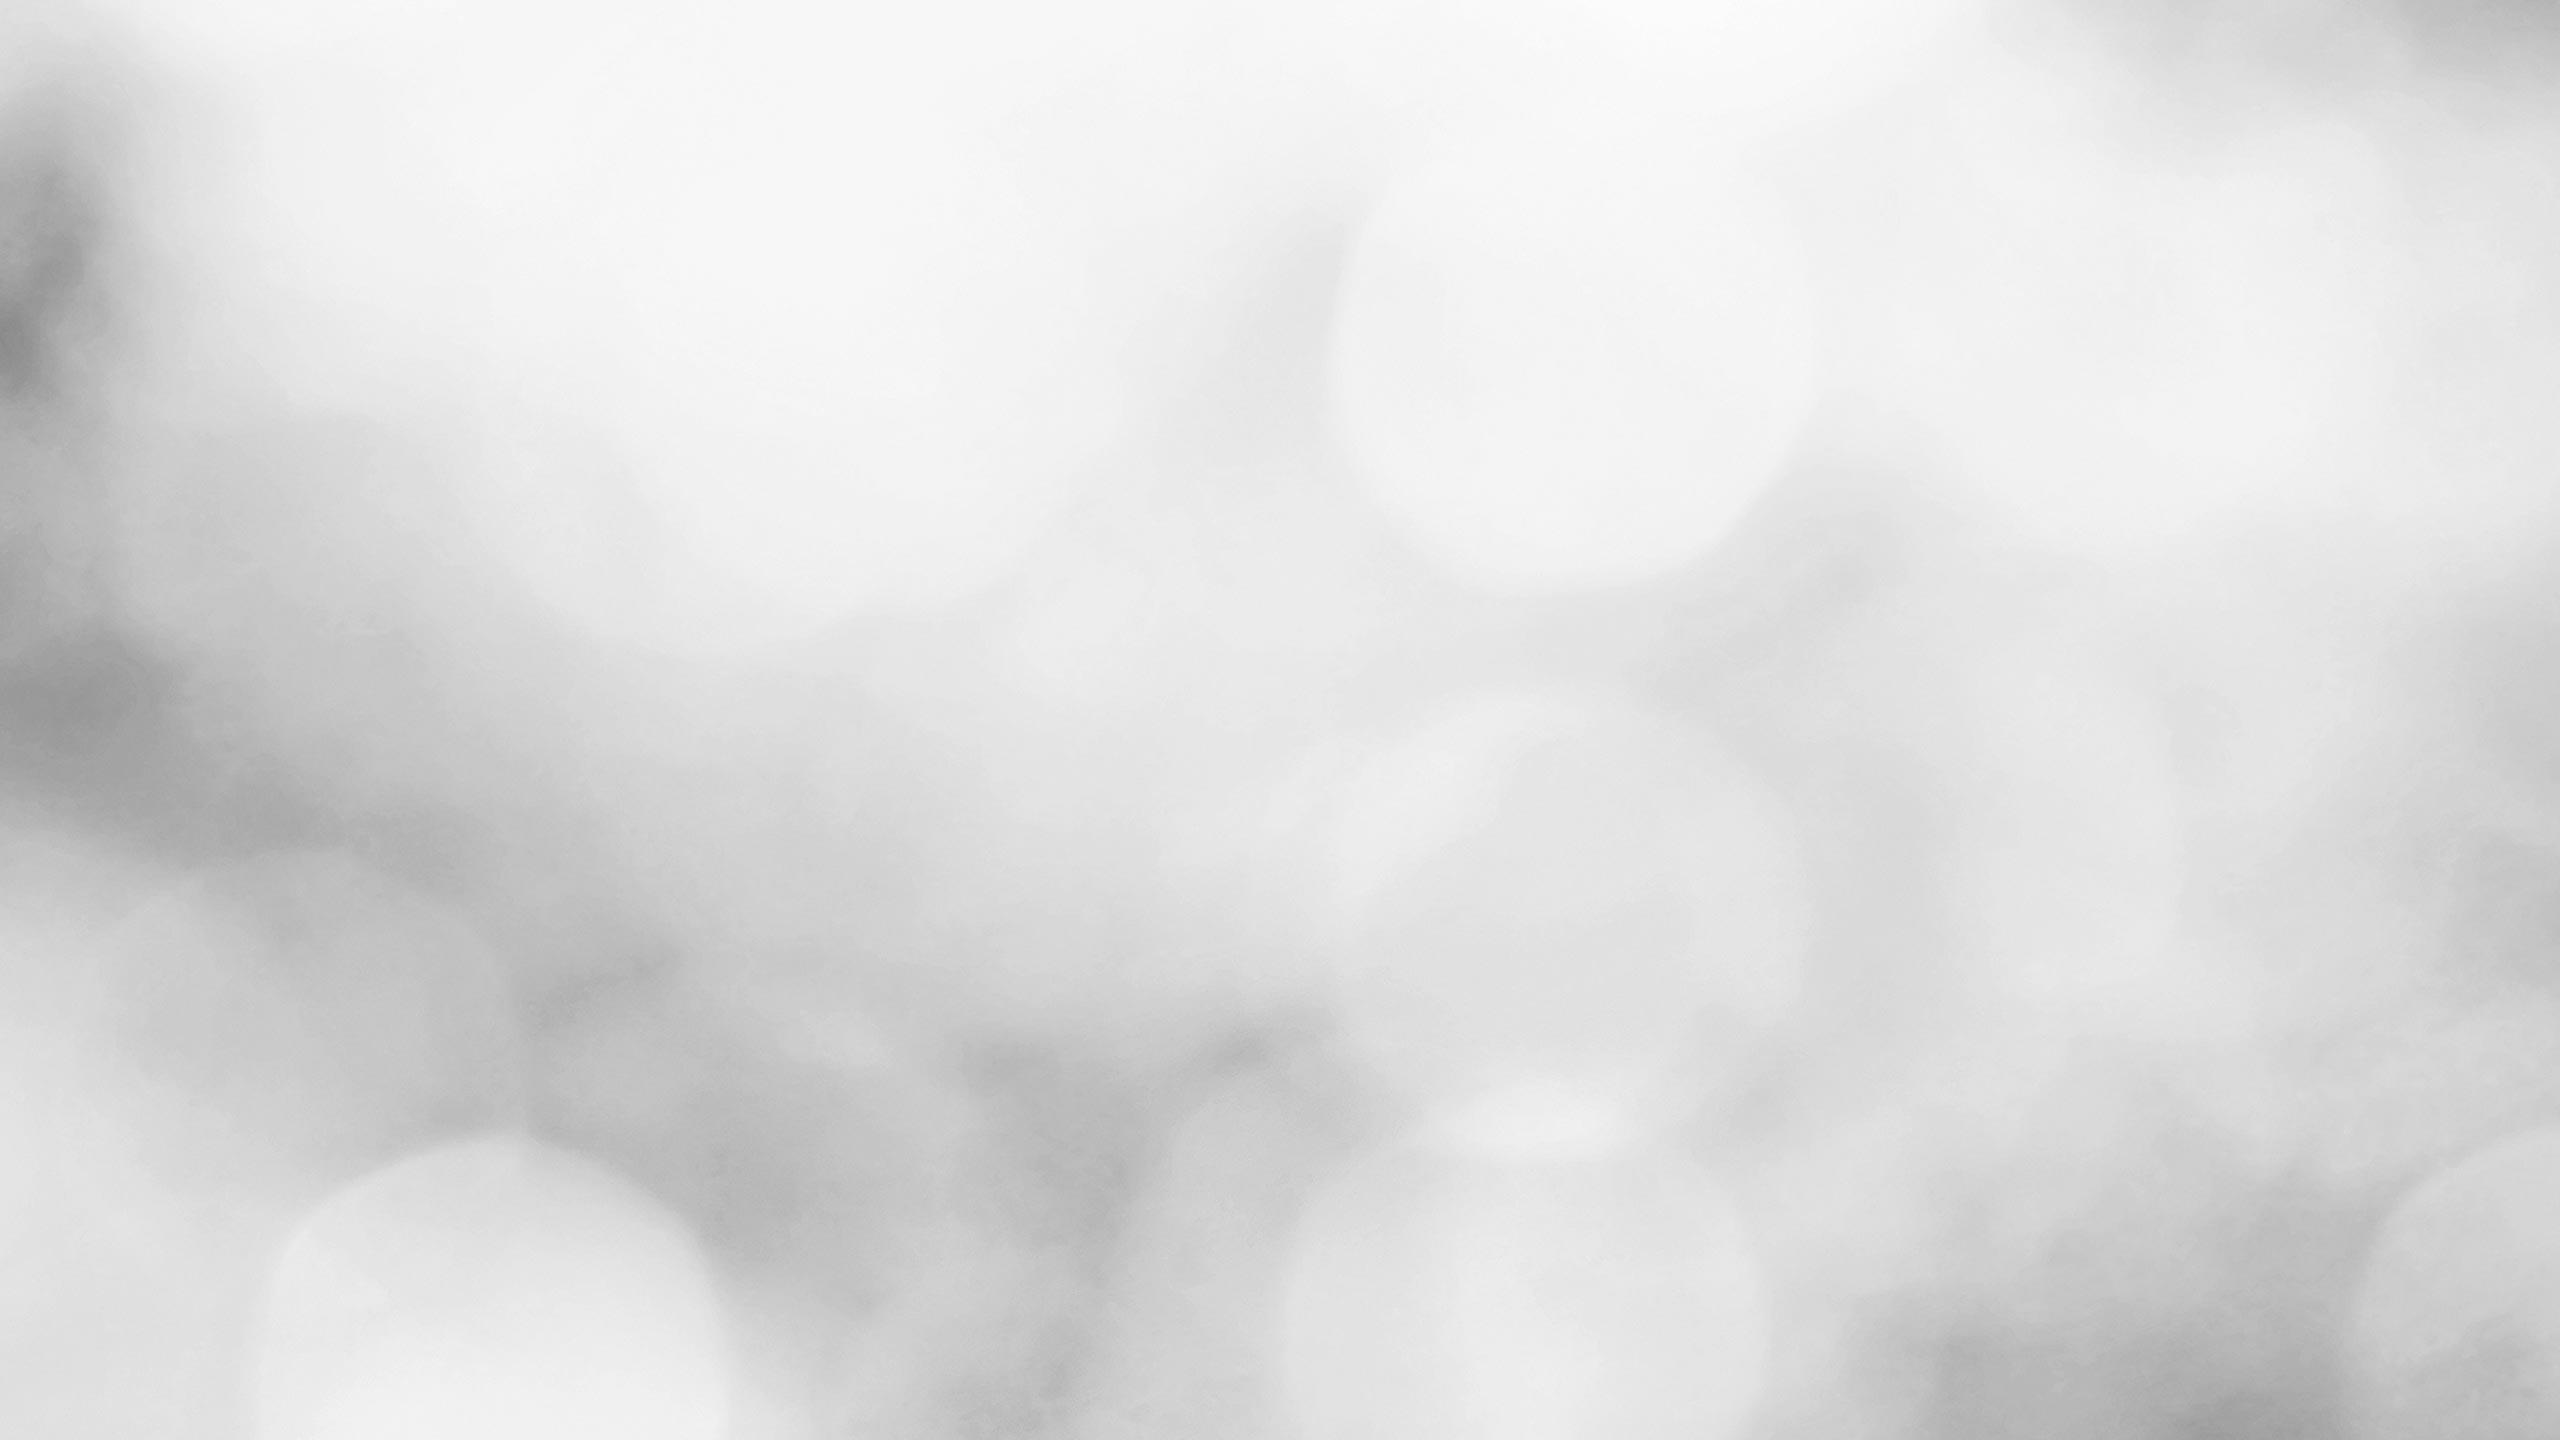 Cute Header Wallpaper Grey Background V1 Repricerexpress